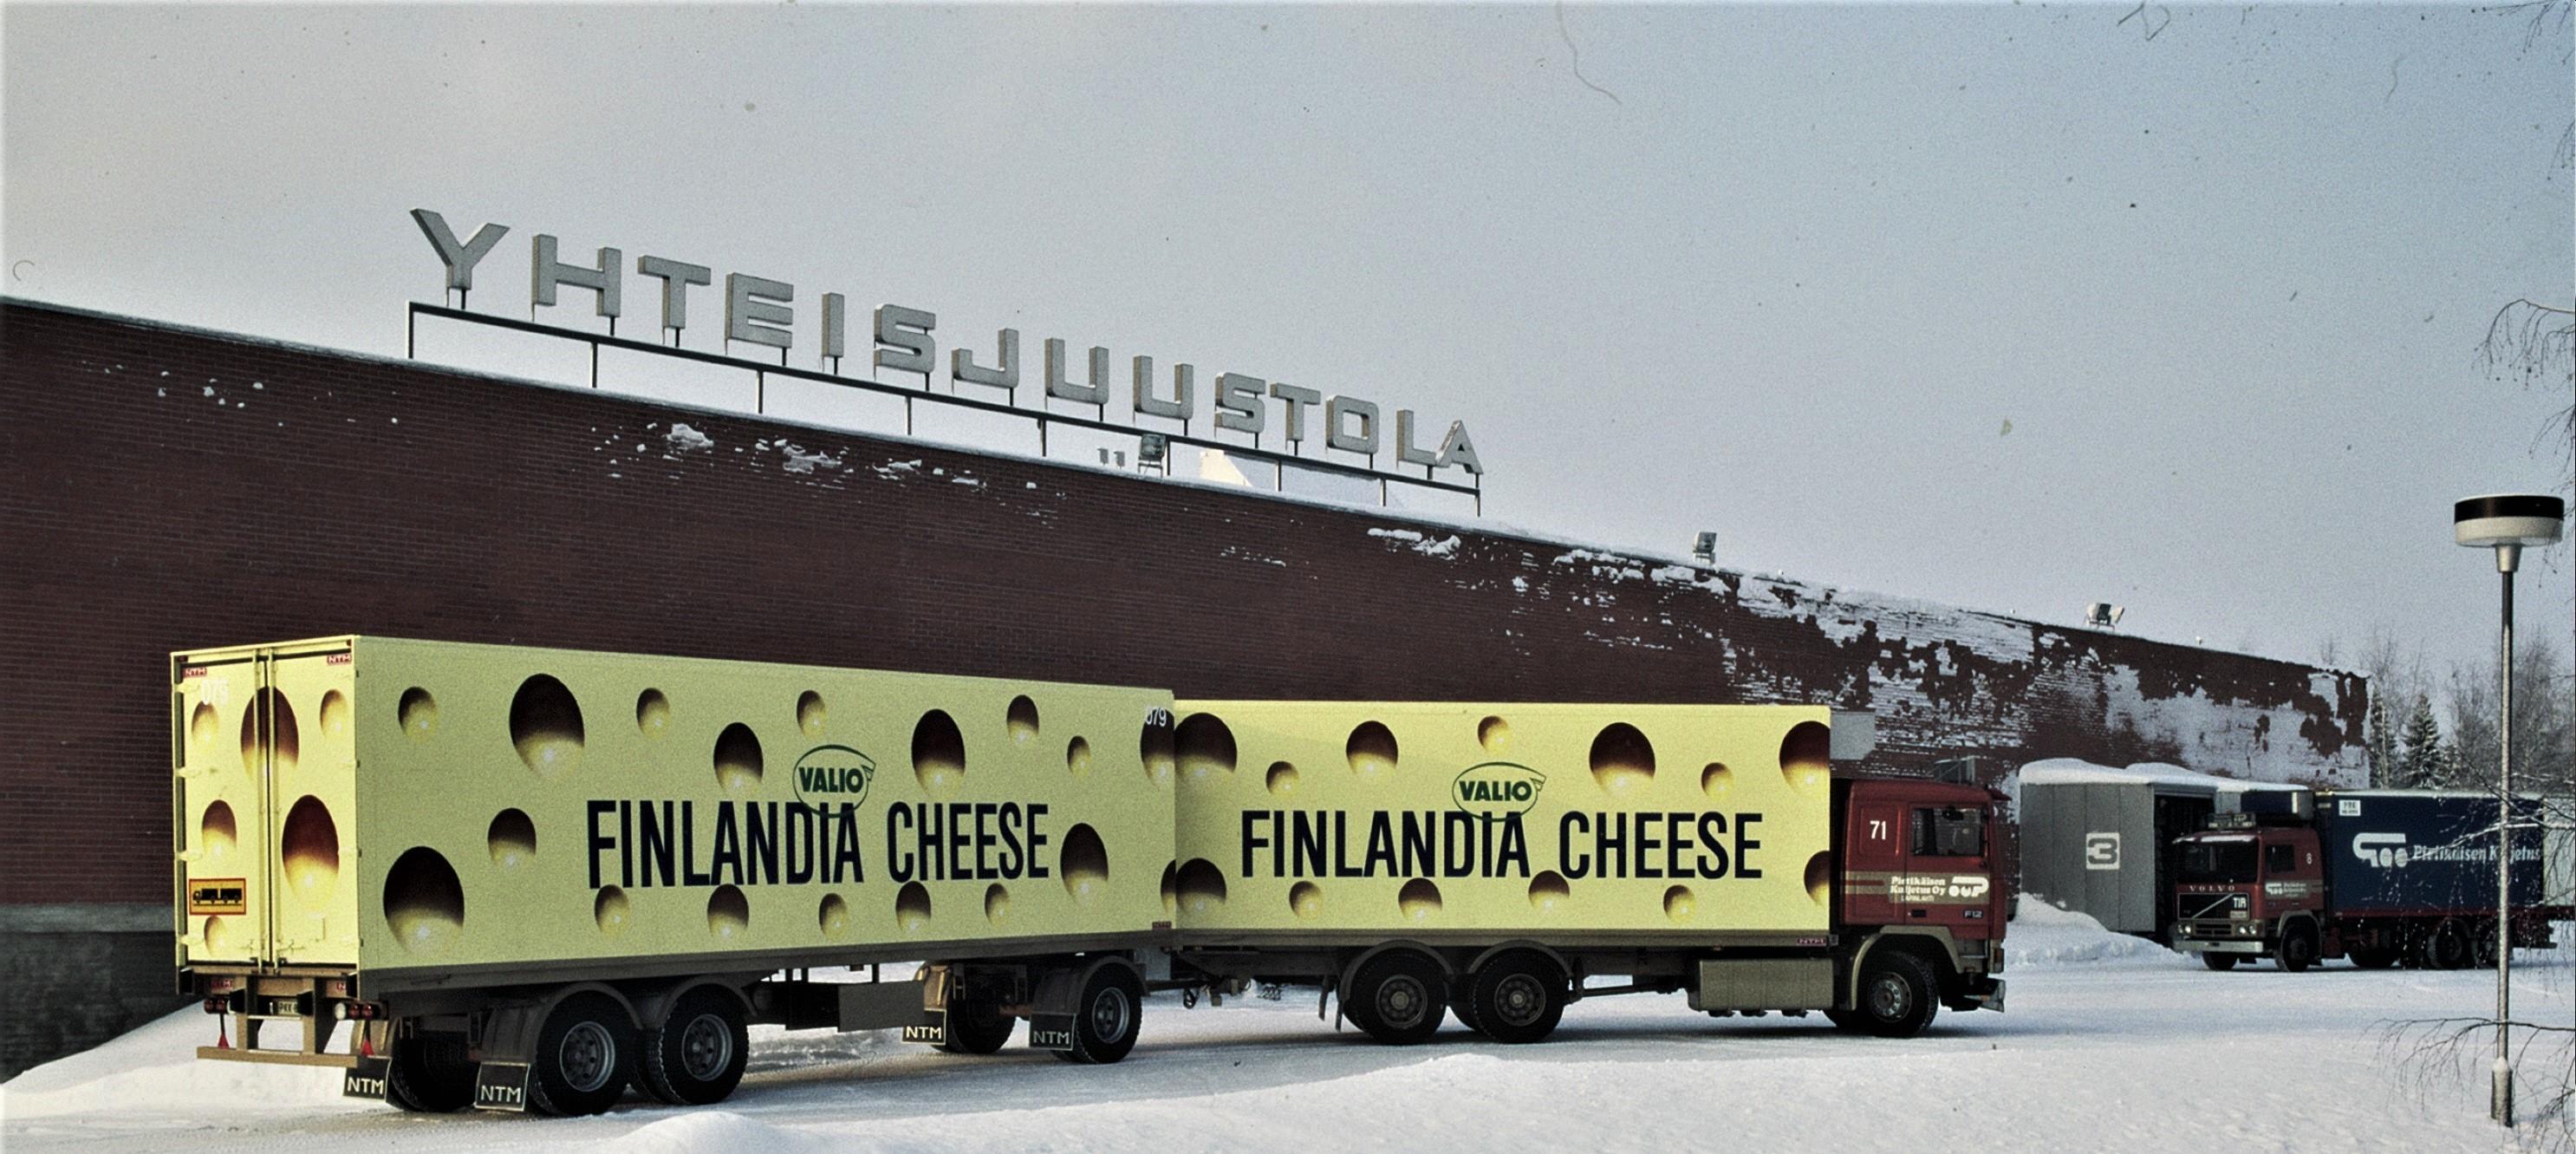 Volvo-Finland